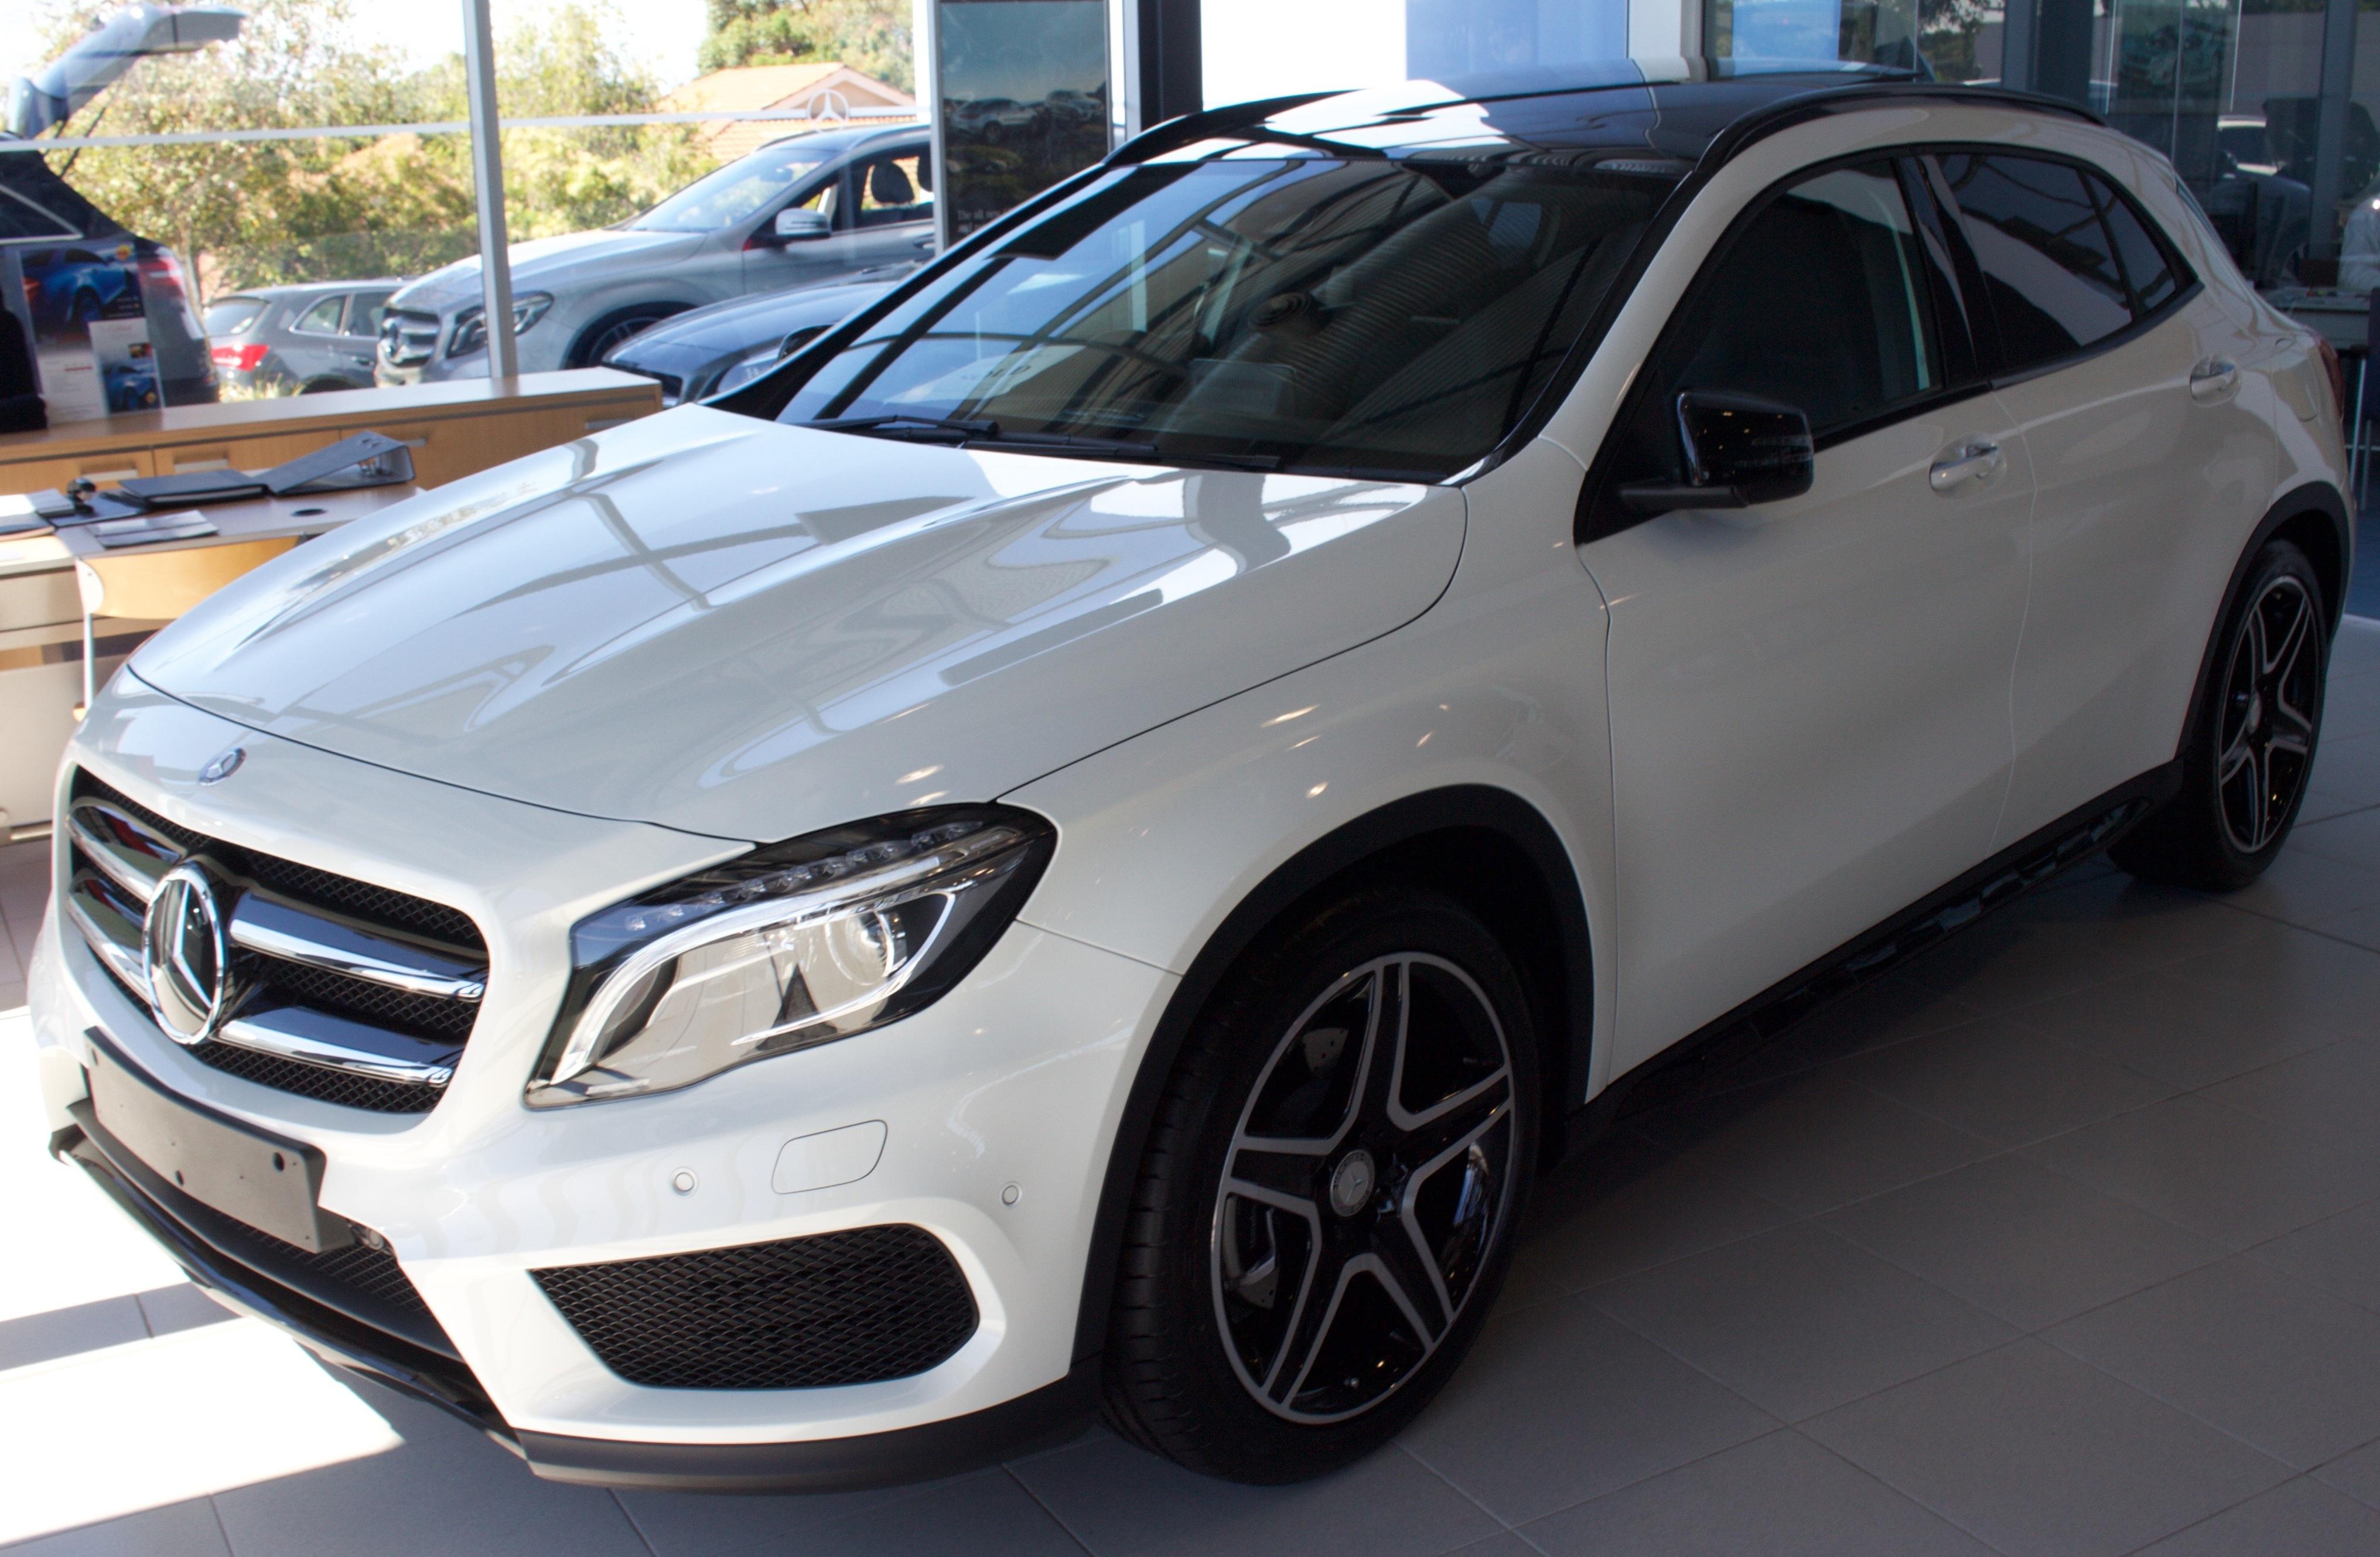 Mercedes Benz Gla History >> File 2016 Mercedes Benz Gla 250 X 156 4matic Wagon 2016 03 05 01